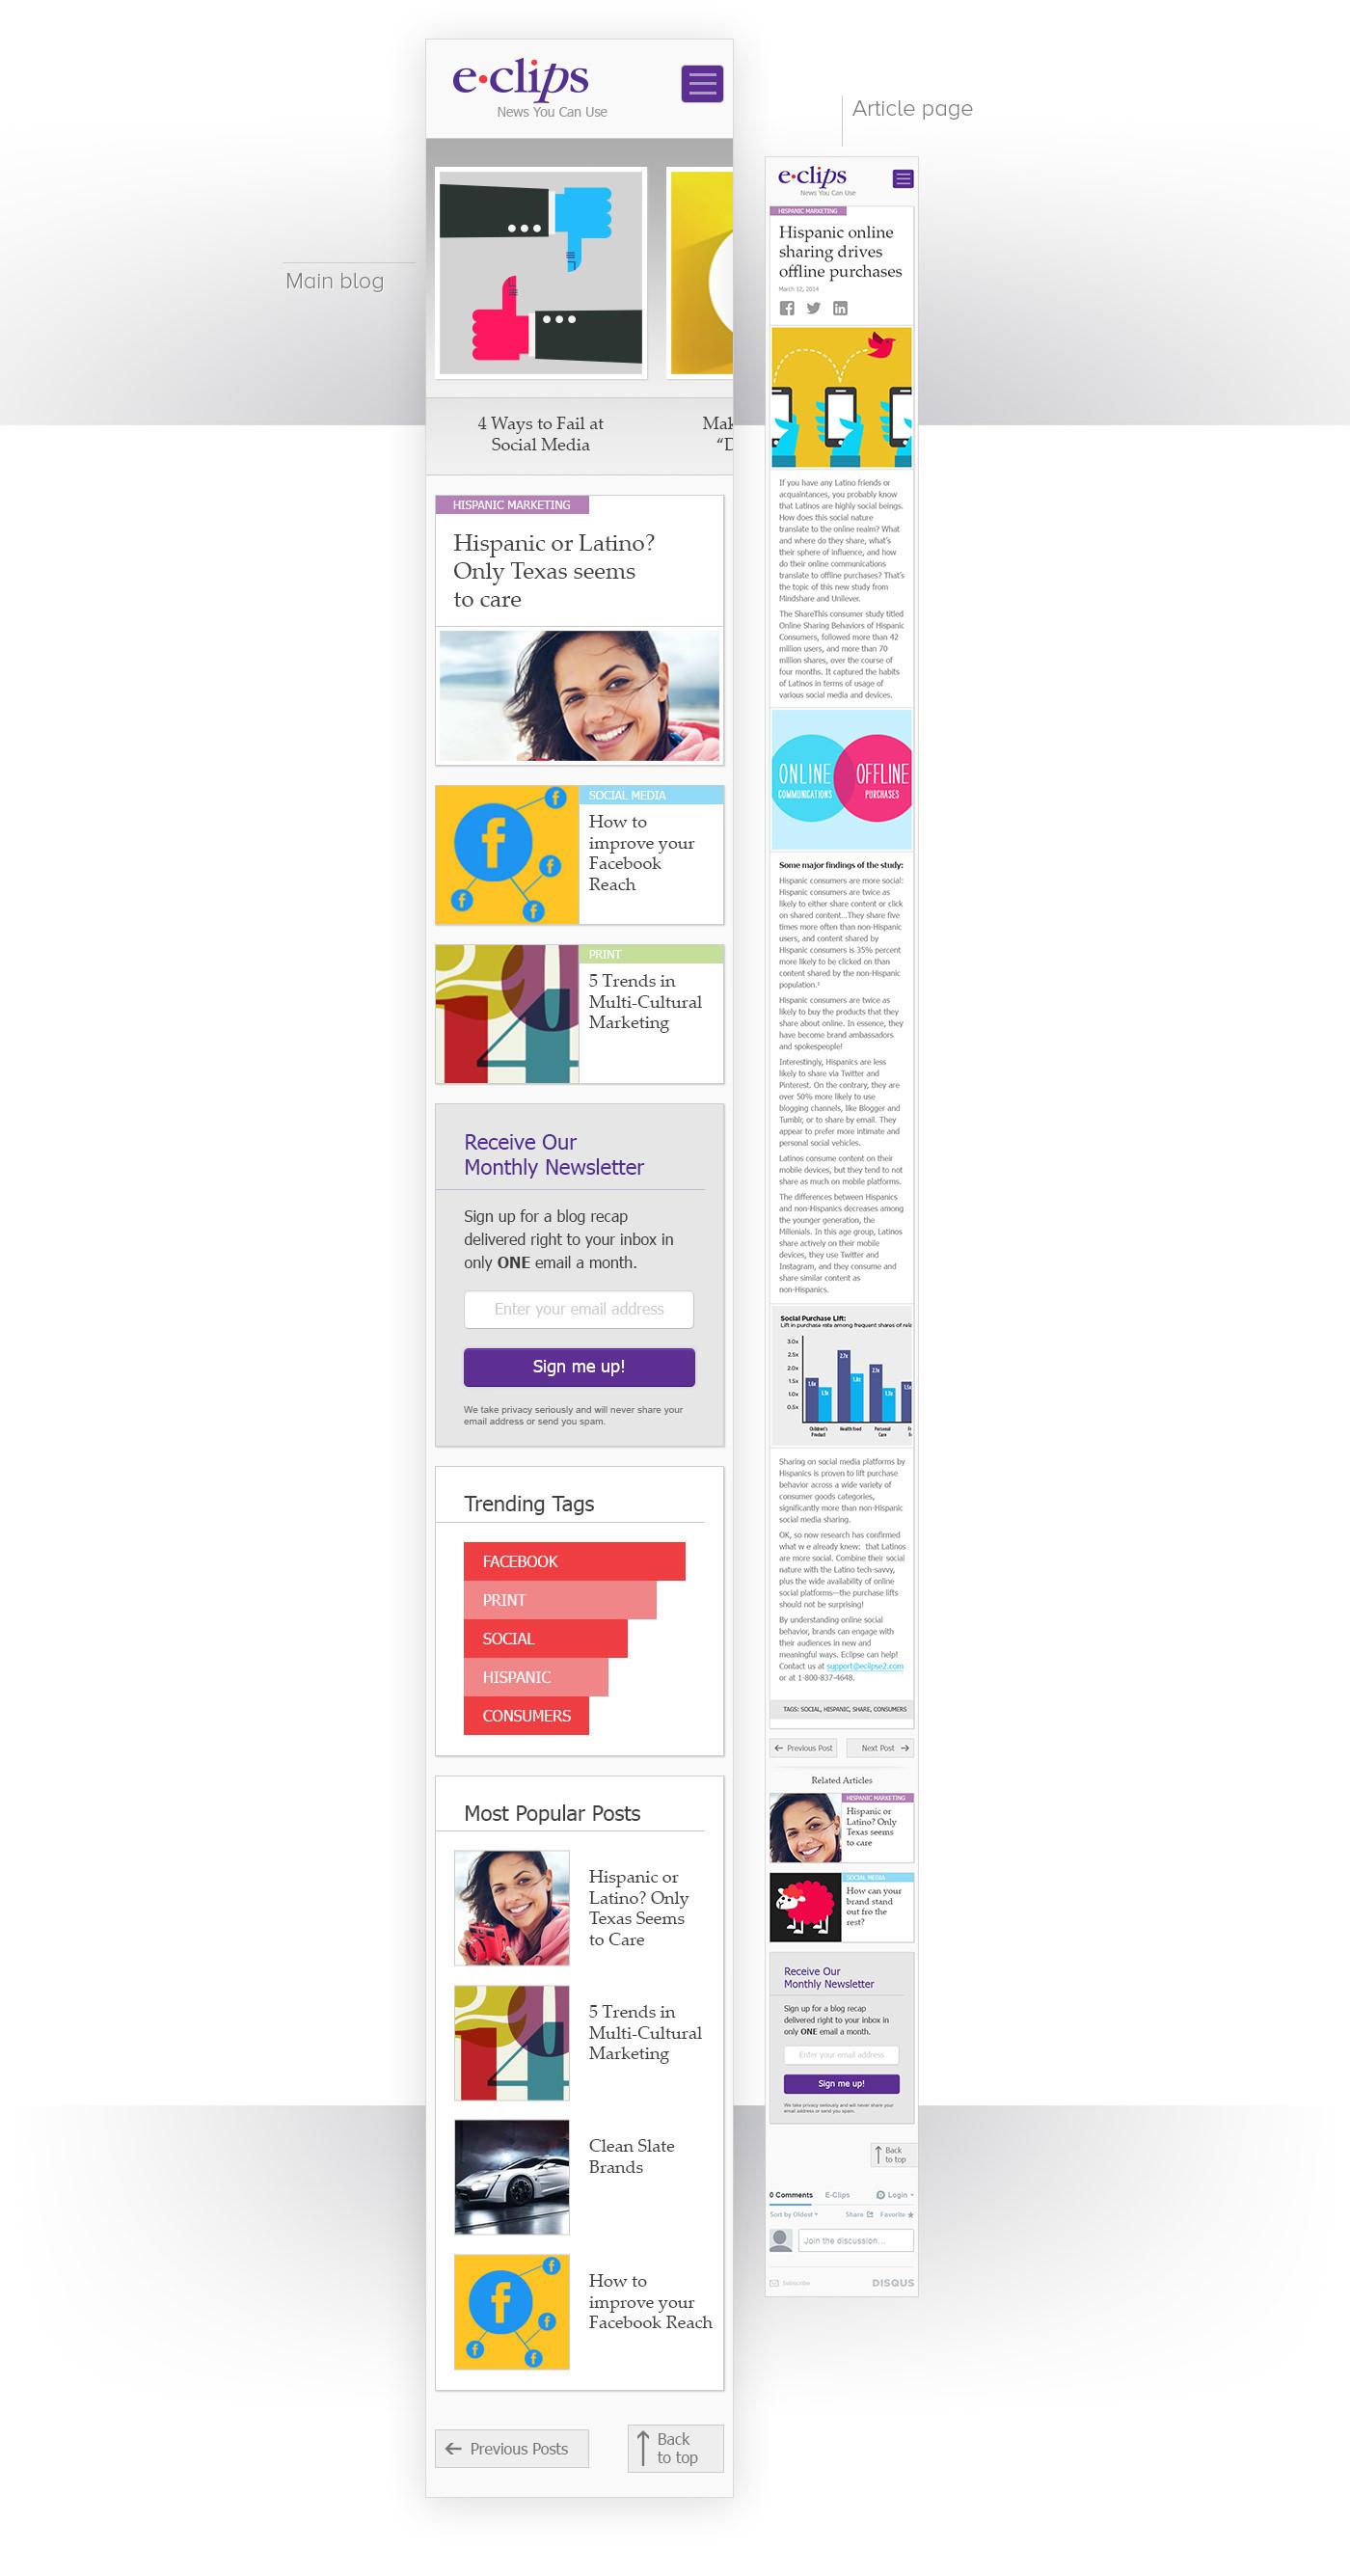 Blog Respsonive desktop tablet mobile user interface user experience style sheet